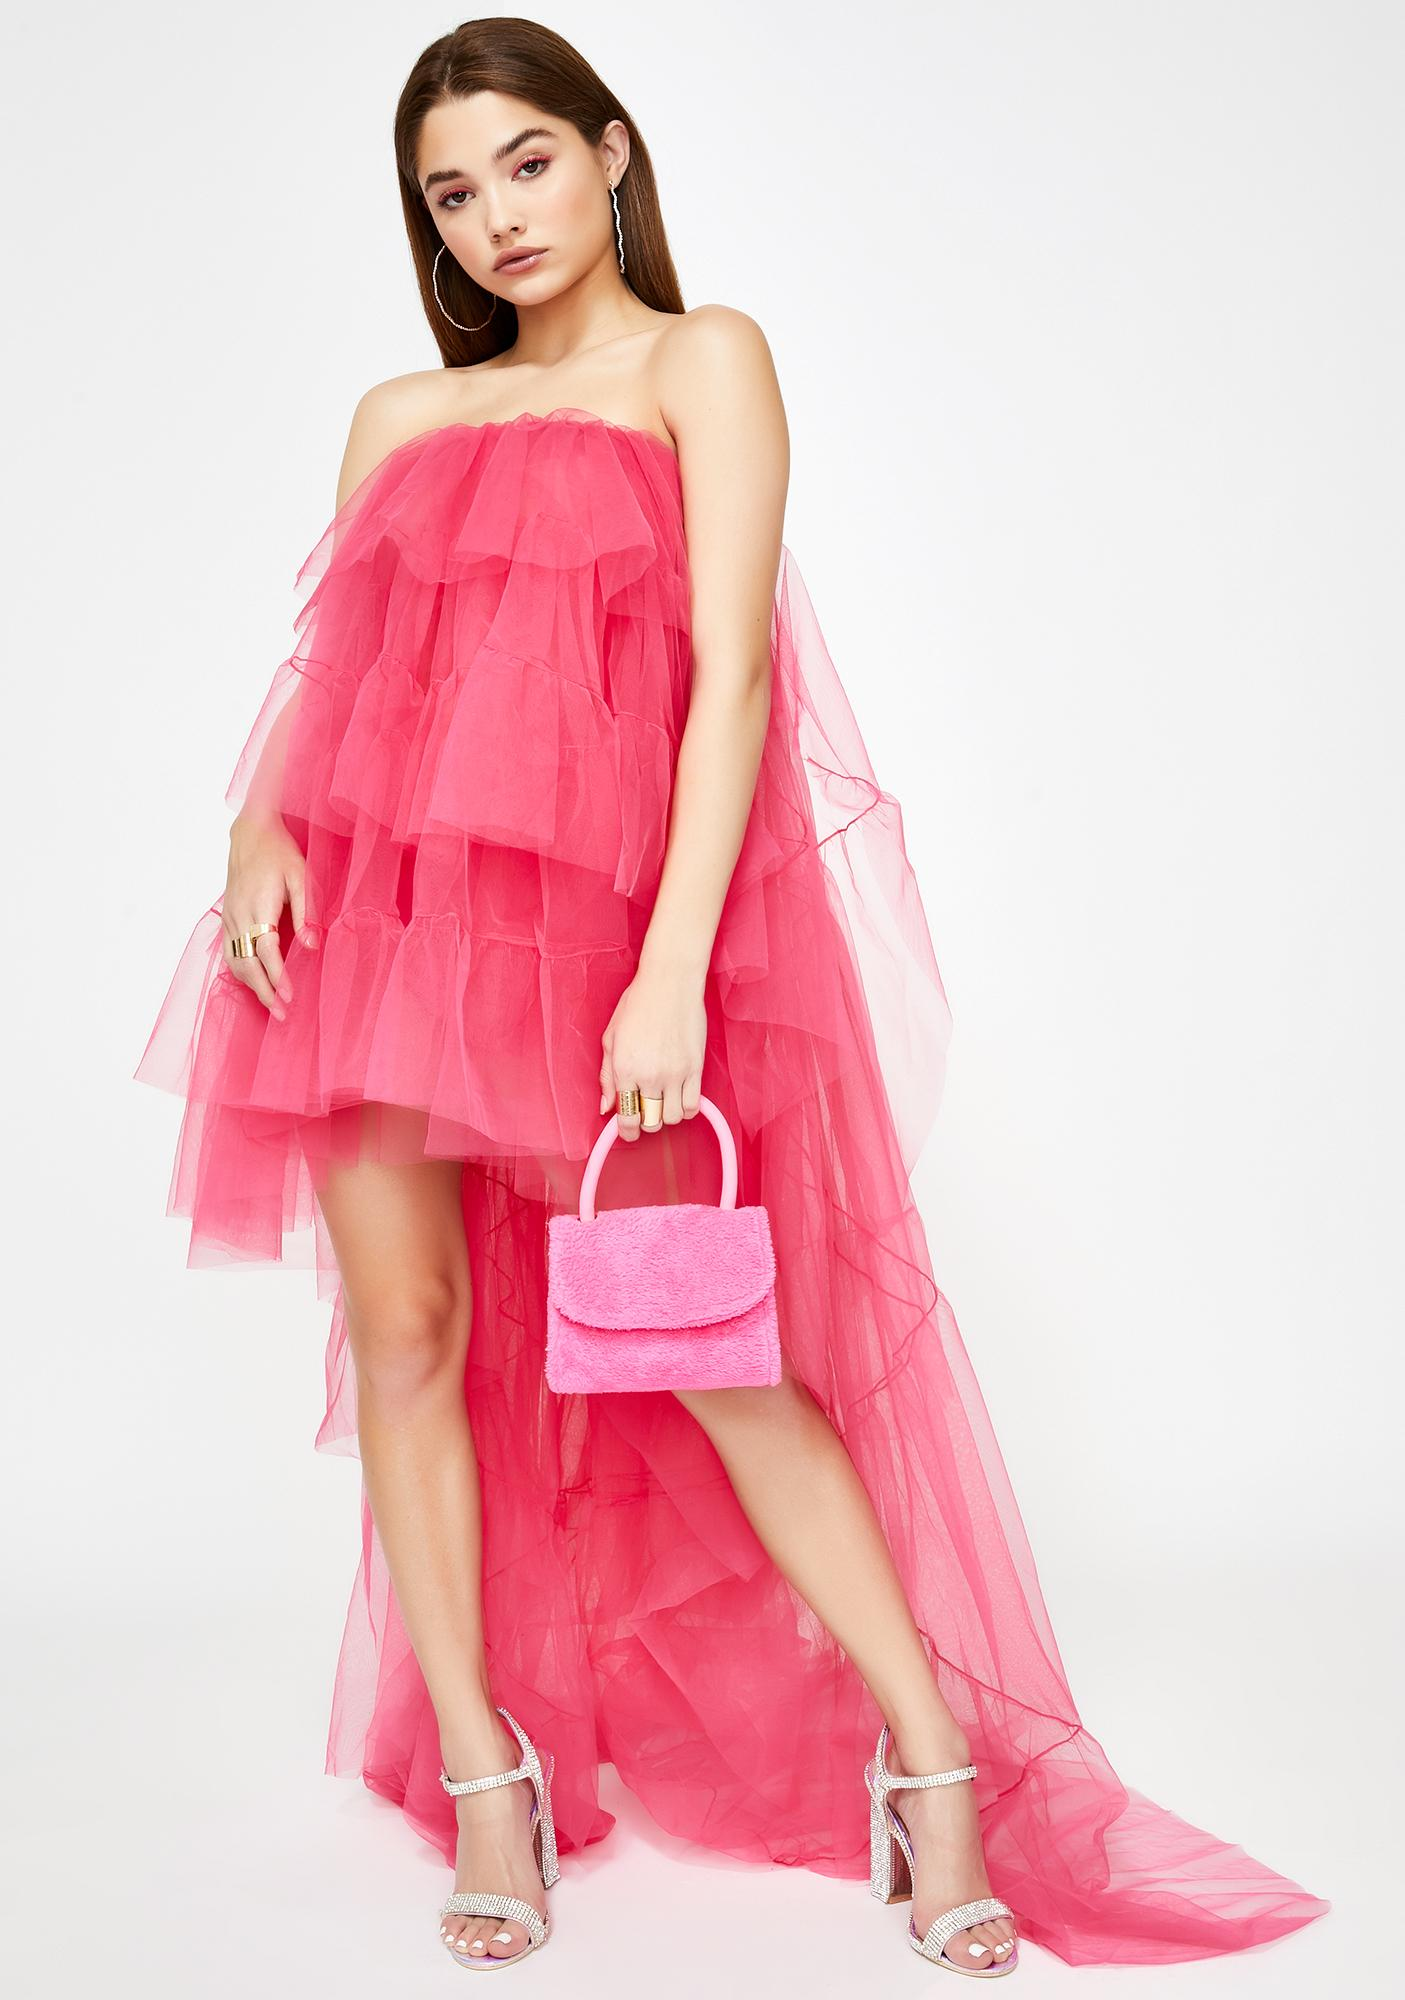 Kiki Riki Ballerina Gone Bad Tulle Dress